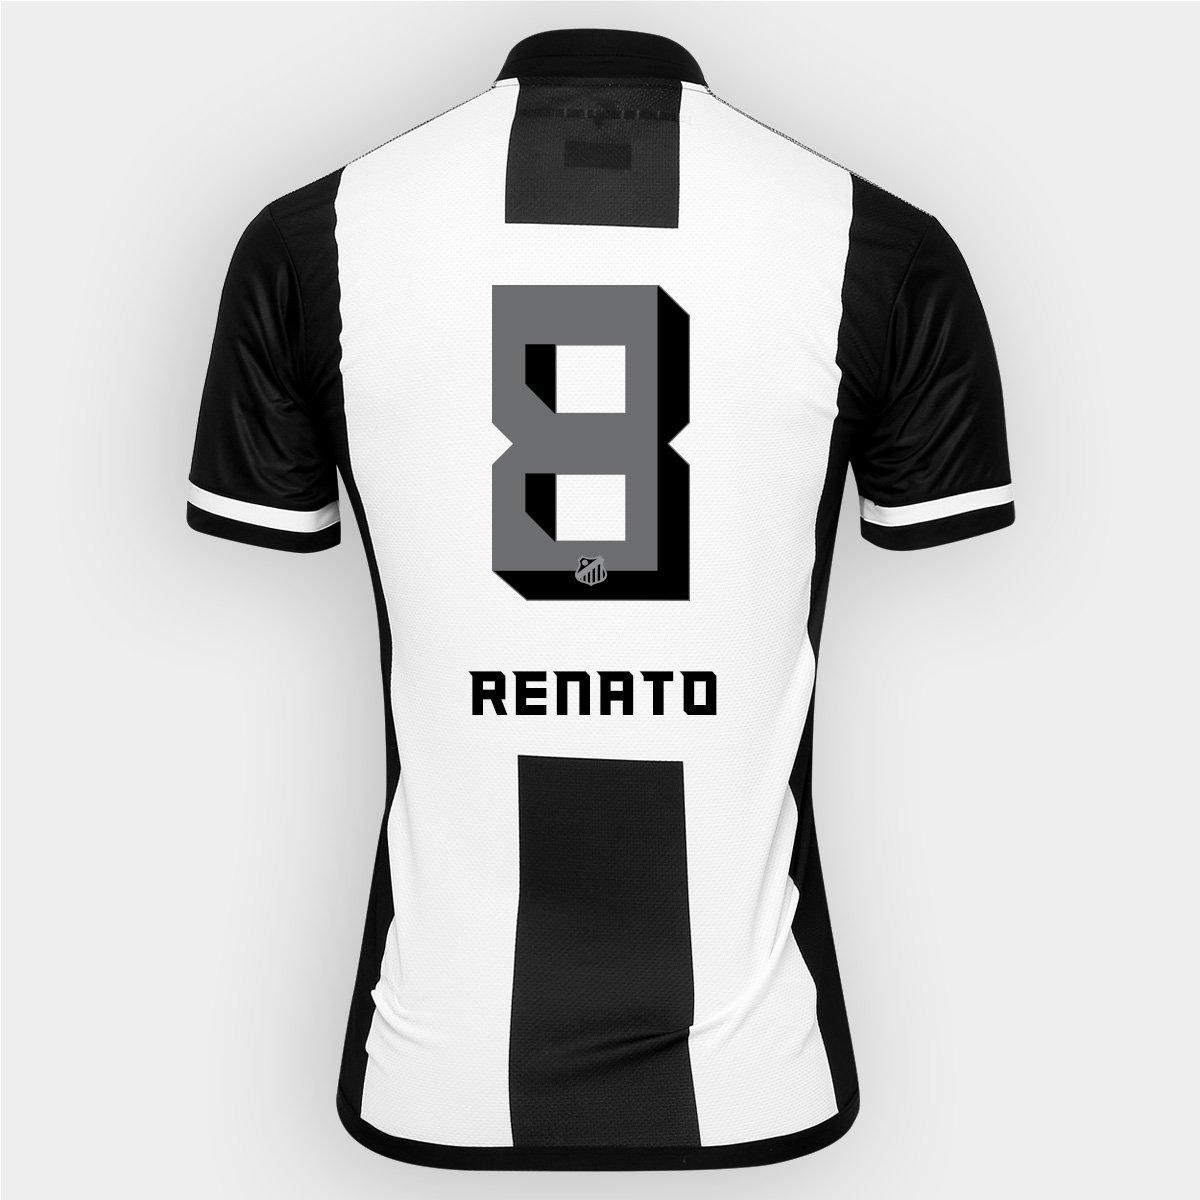 Camisa Kappa Santos II 2016 nº 8 - Renato - Compre Agora  f94ecfb939a5e